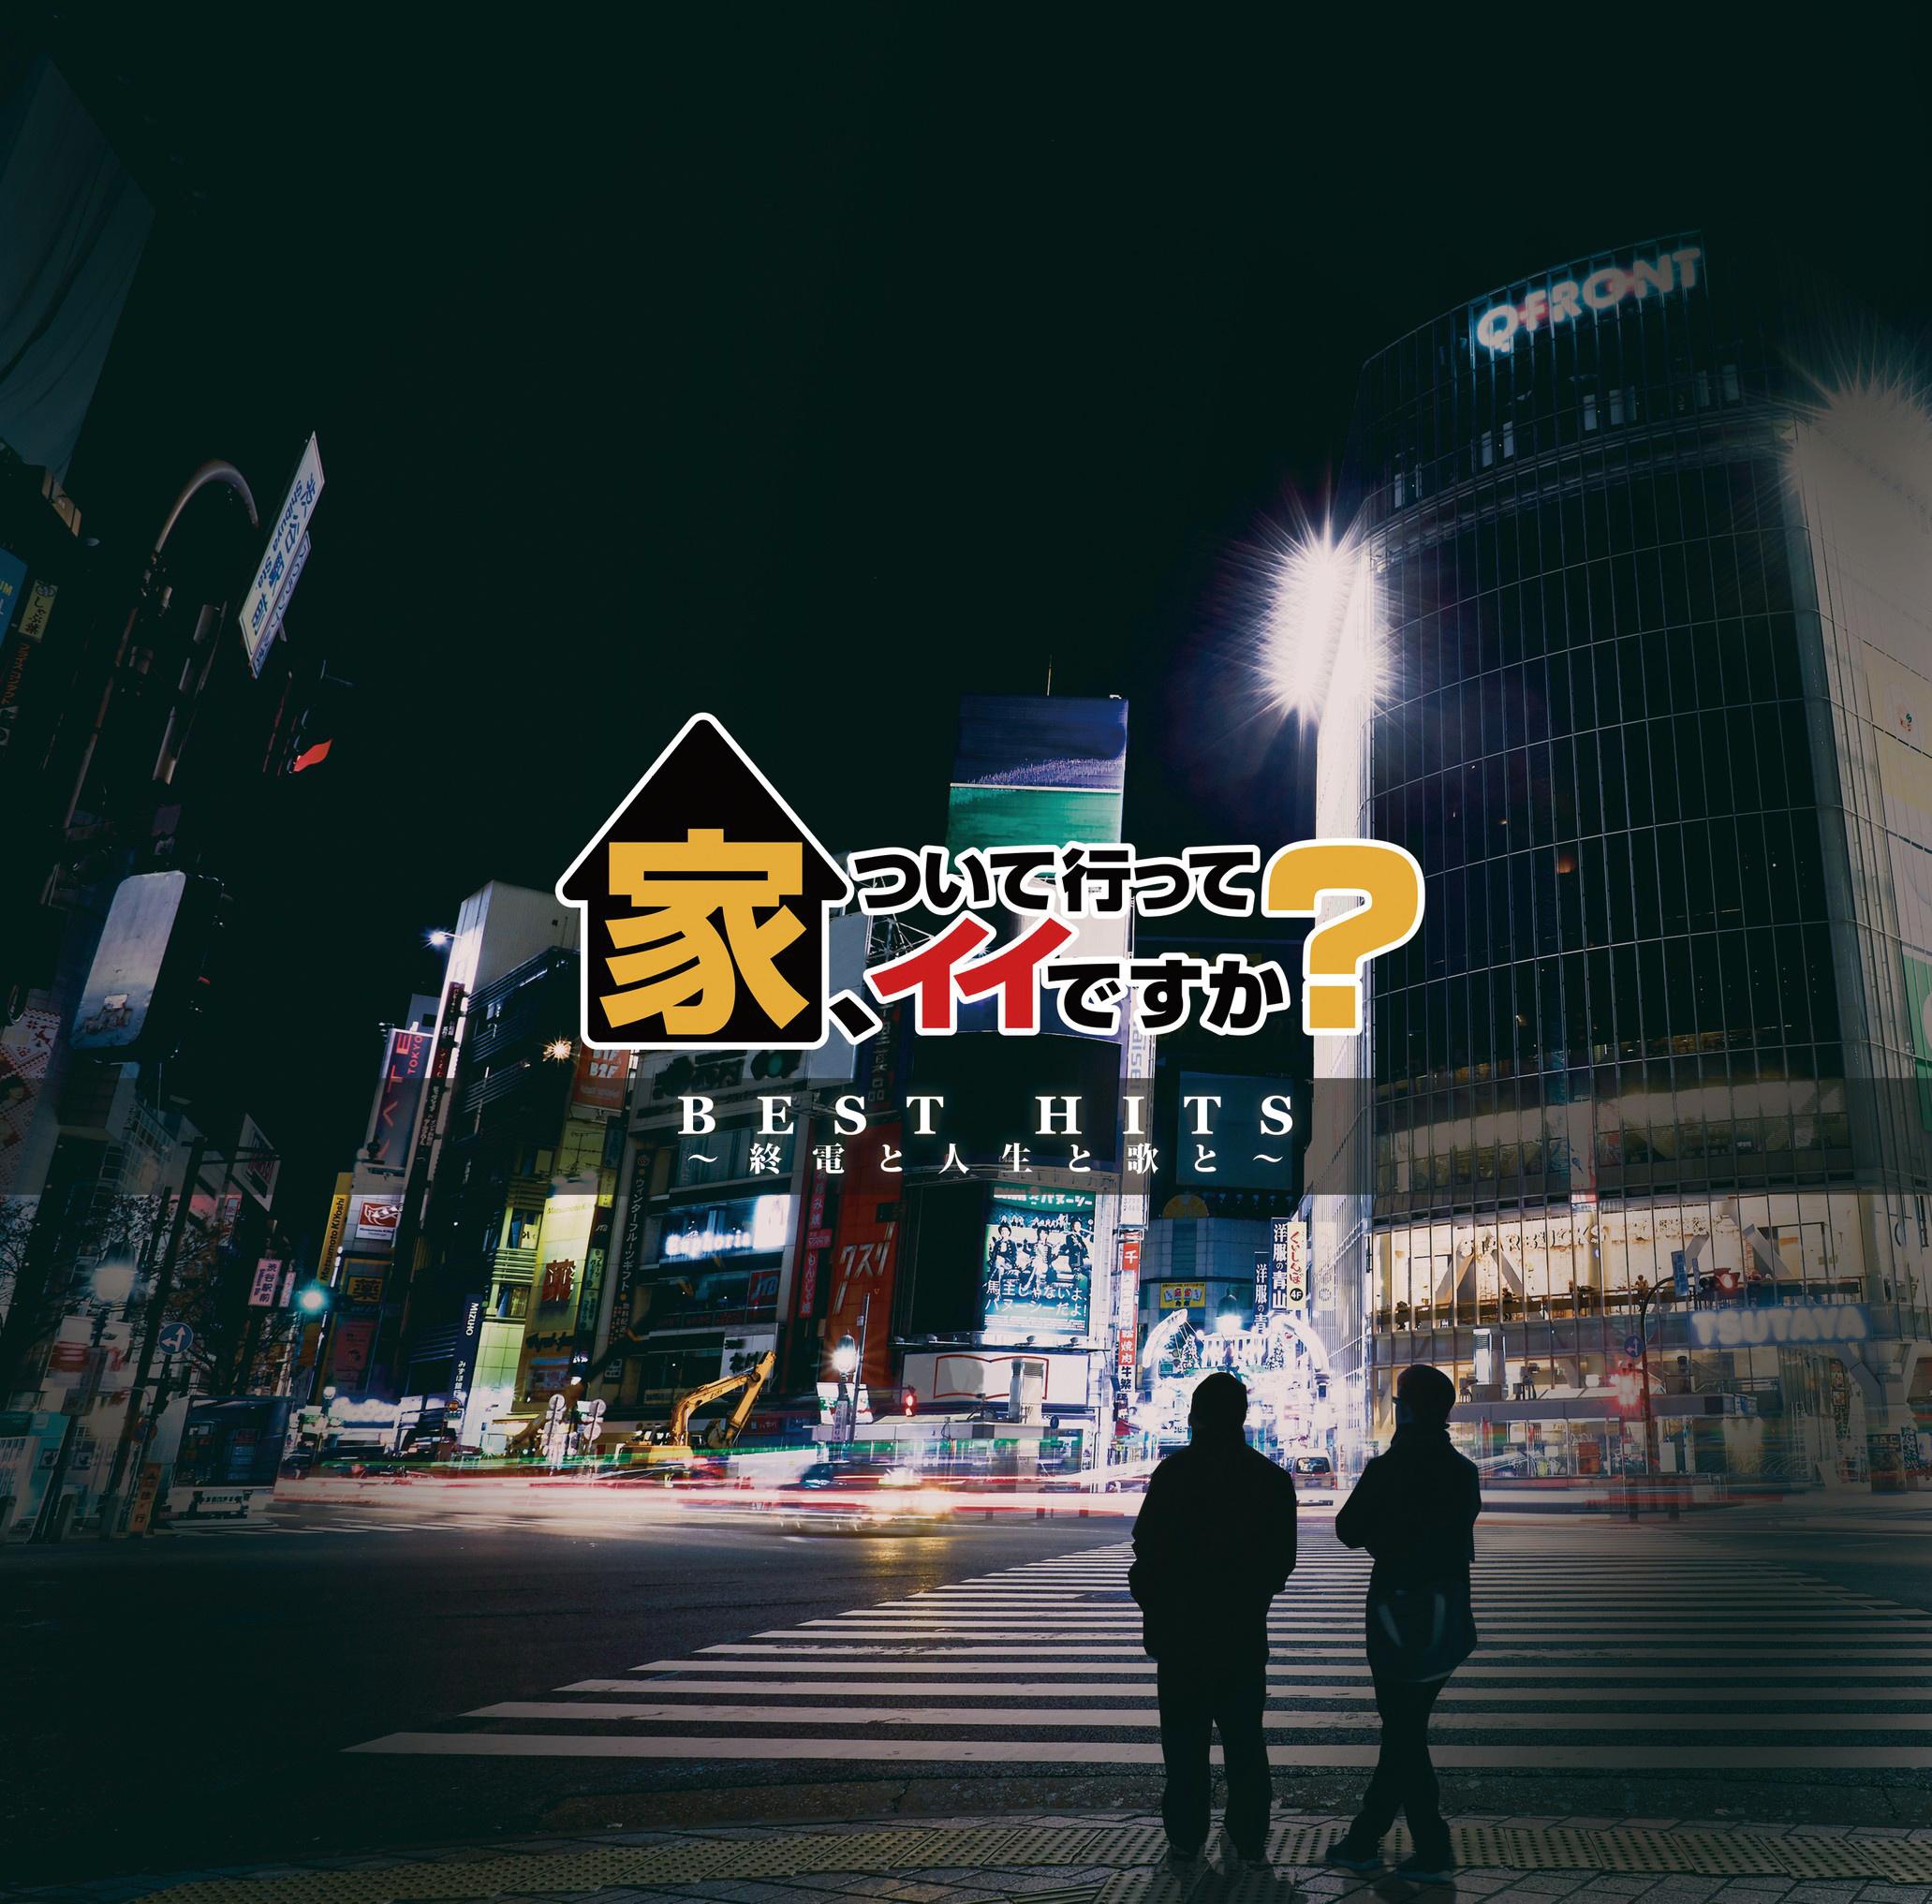 TV東京「家、ついて行ってイイですか?」コンピレーションアルバム